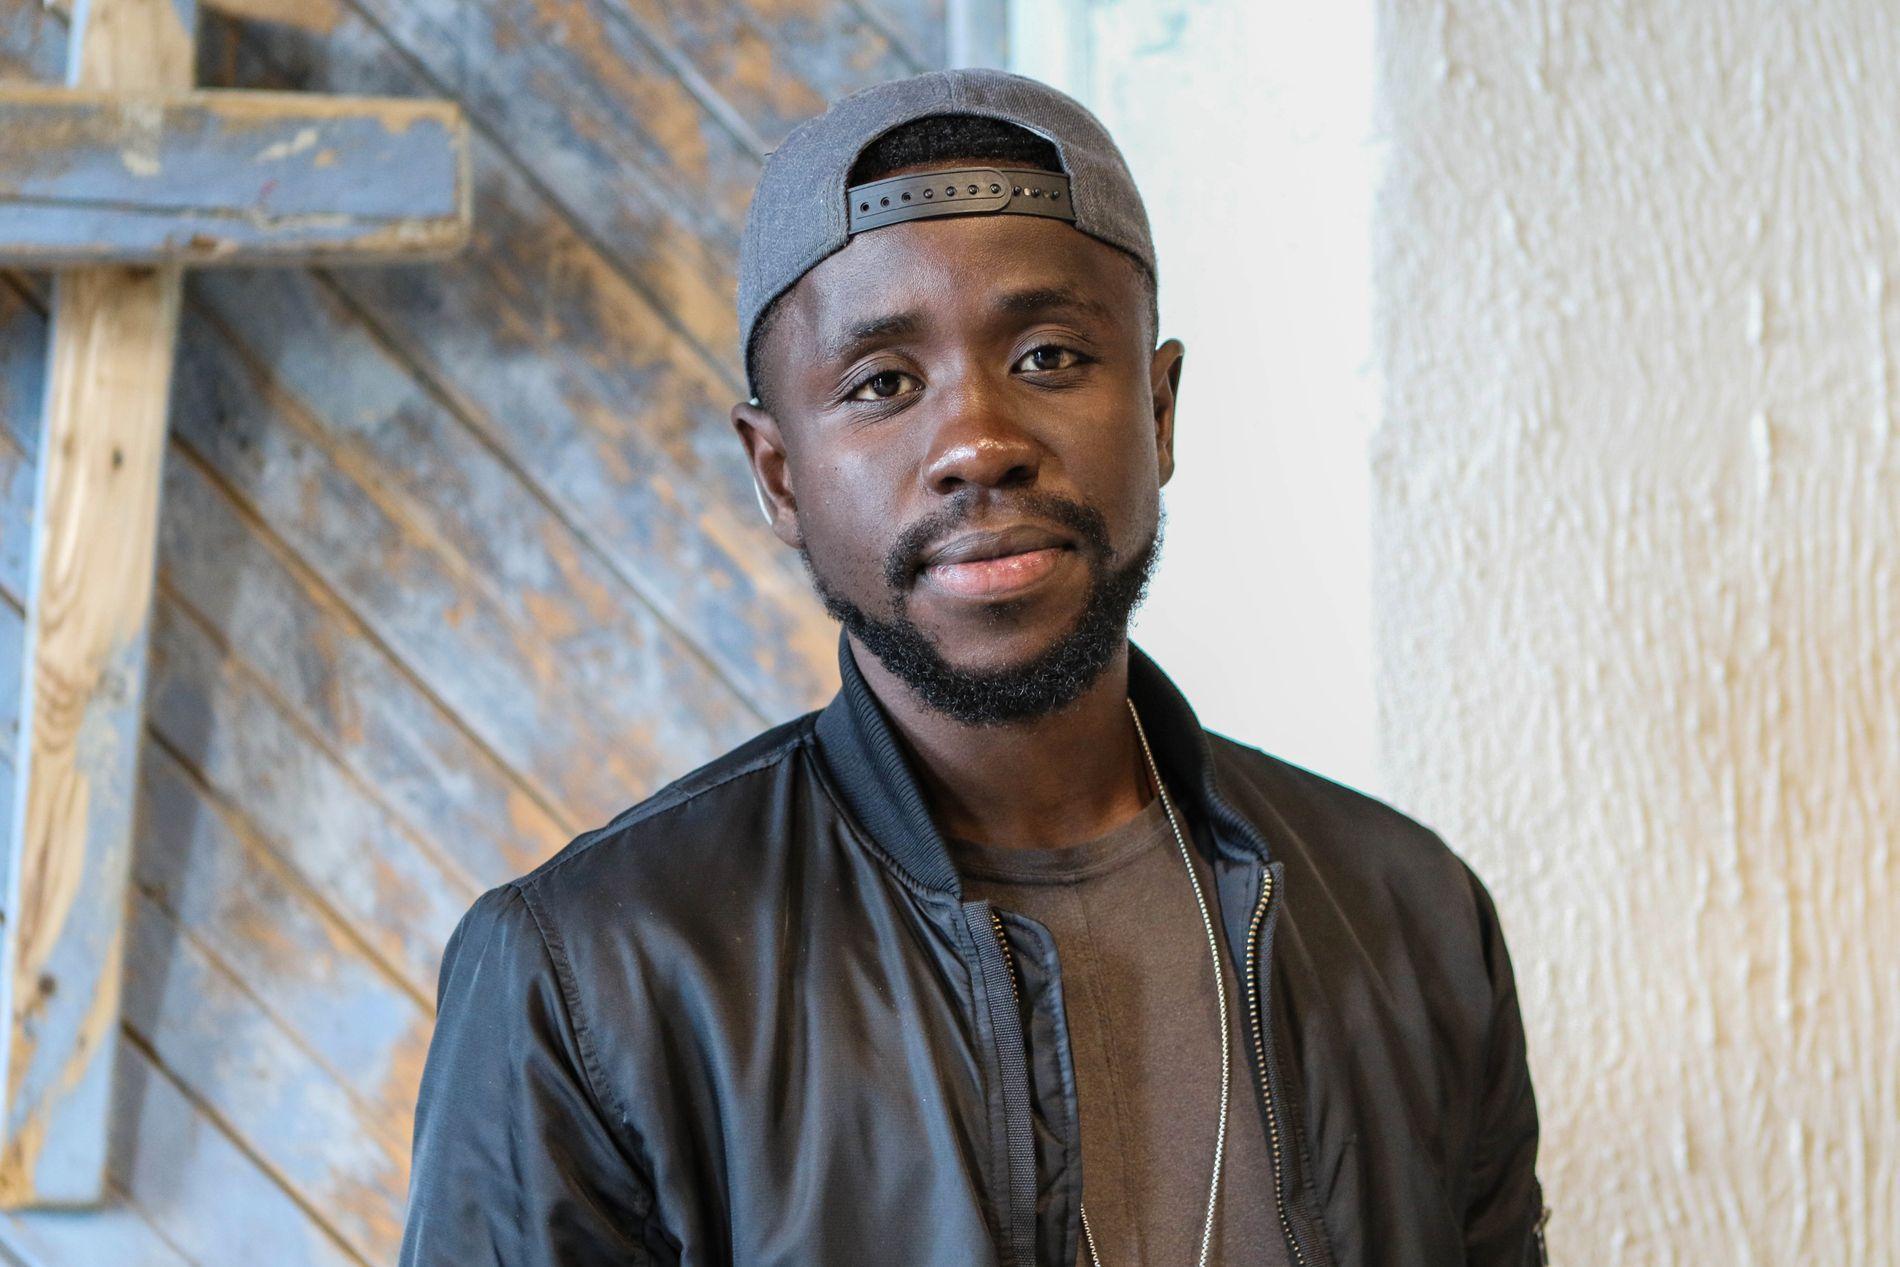 TALENT: Mugisho David Nhonzi (24) er både produsent, låtskriver og sanger. Foto: RANO AKBAR / VG